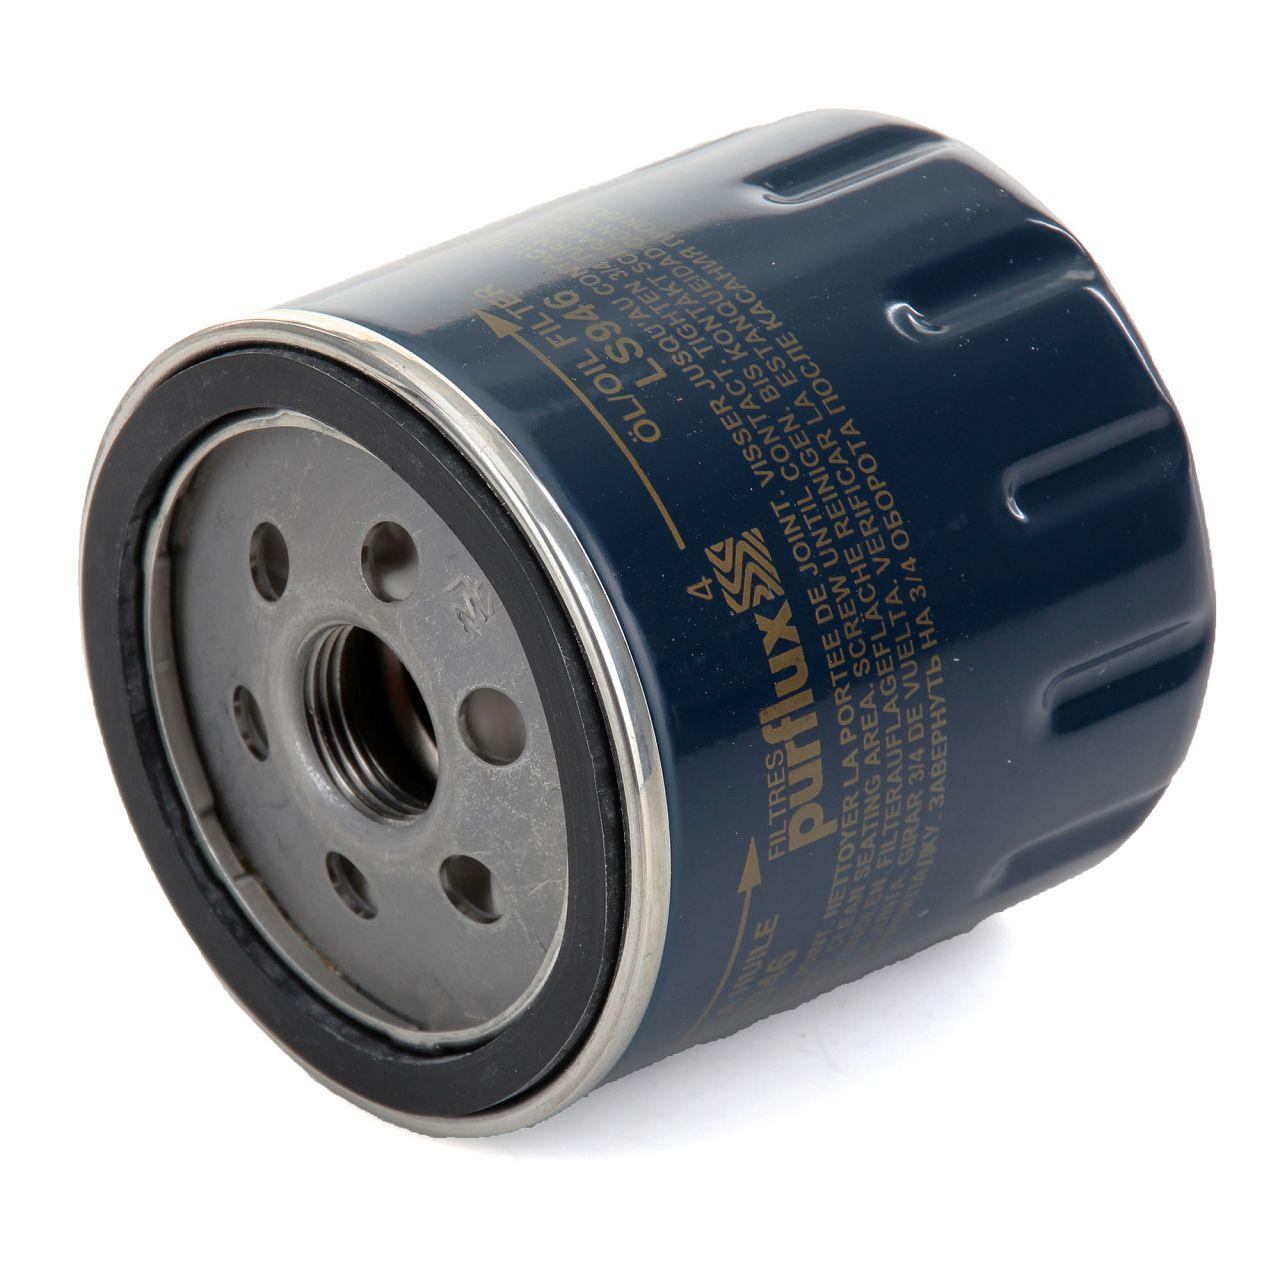 Inspektionskit Filterpaket Filterset für DACIA DOKKER + LODGY 1.5 dCi 75 / 90 PS